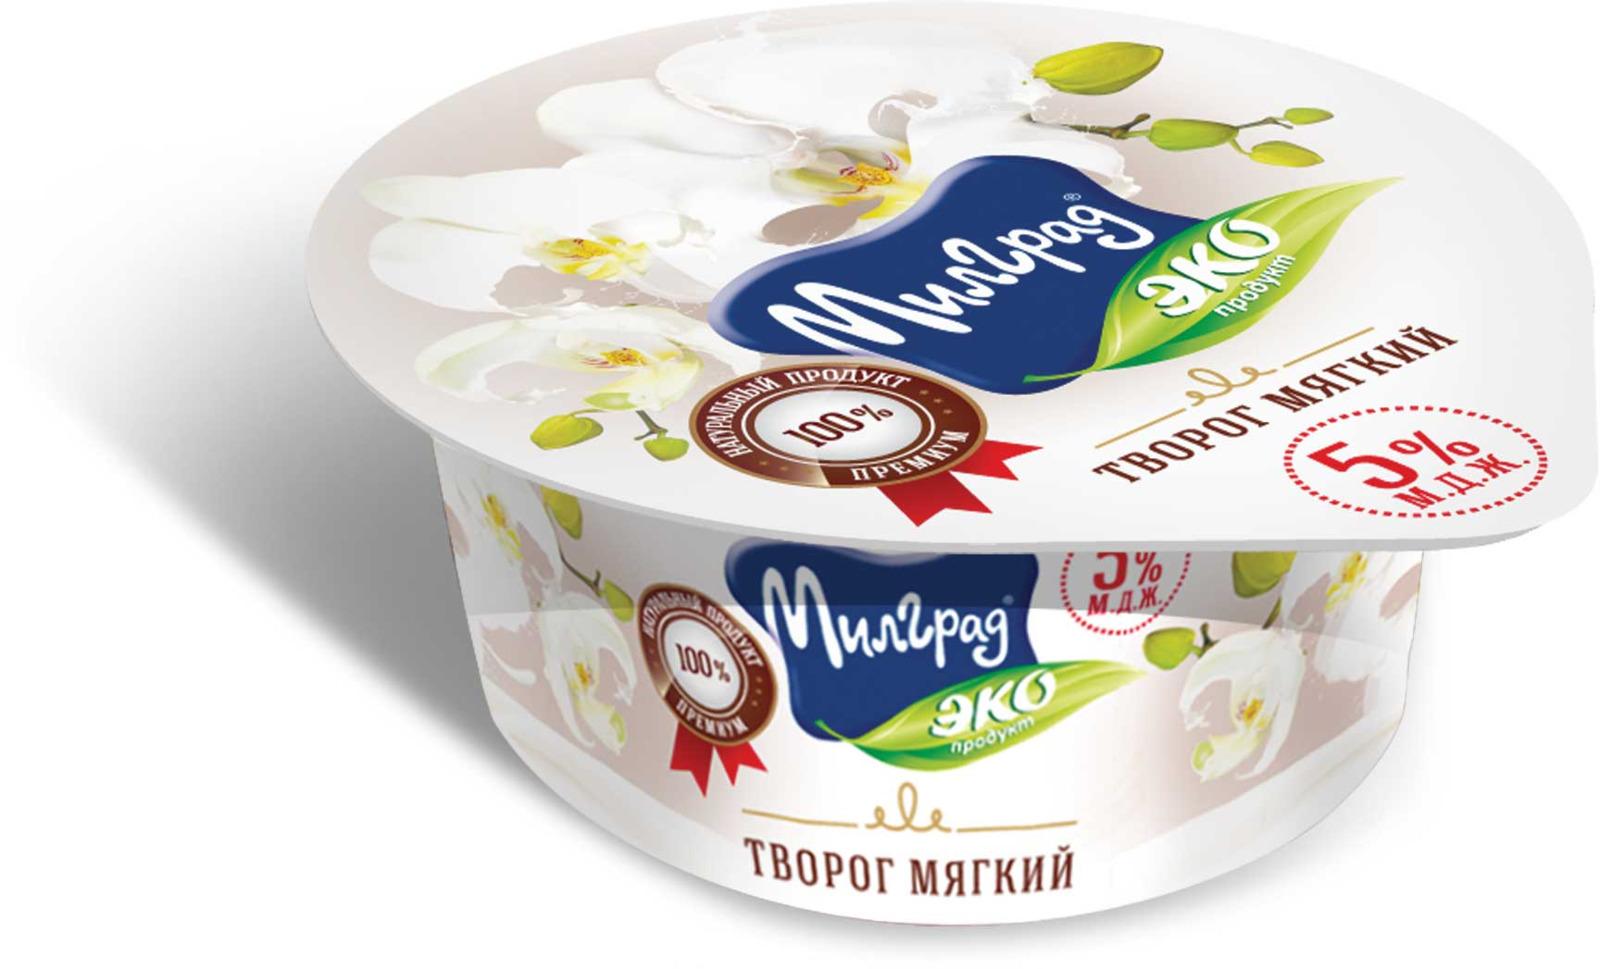 Творог Милград, мягкий, 5%, 120 г вкусный день творог 5